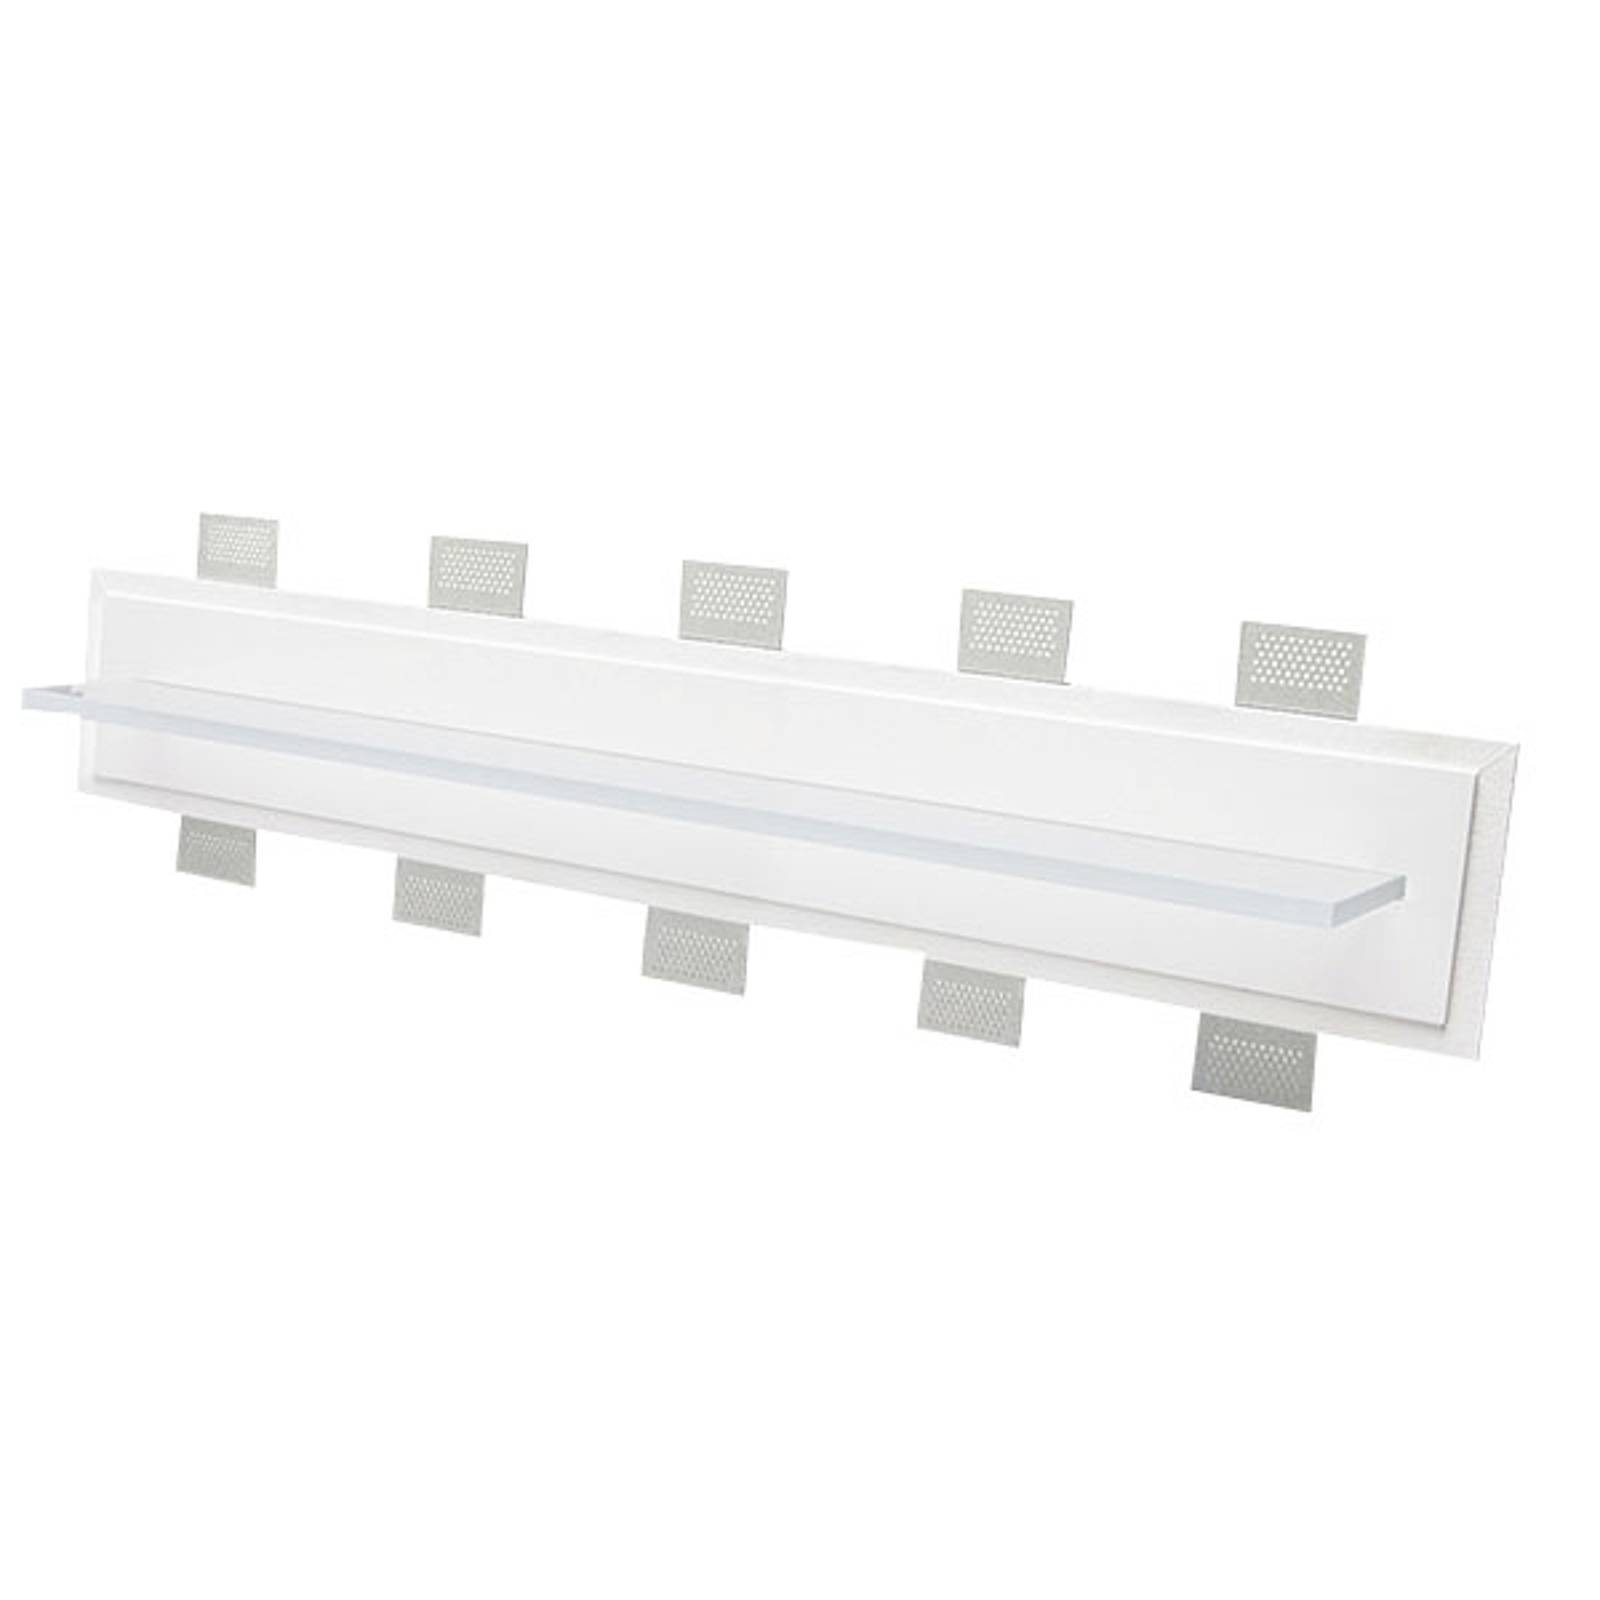 LED-seinäuppovalaisin 2484C, leveys 100 cm 2 700 K